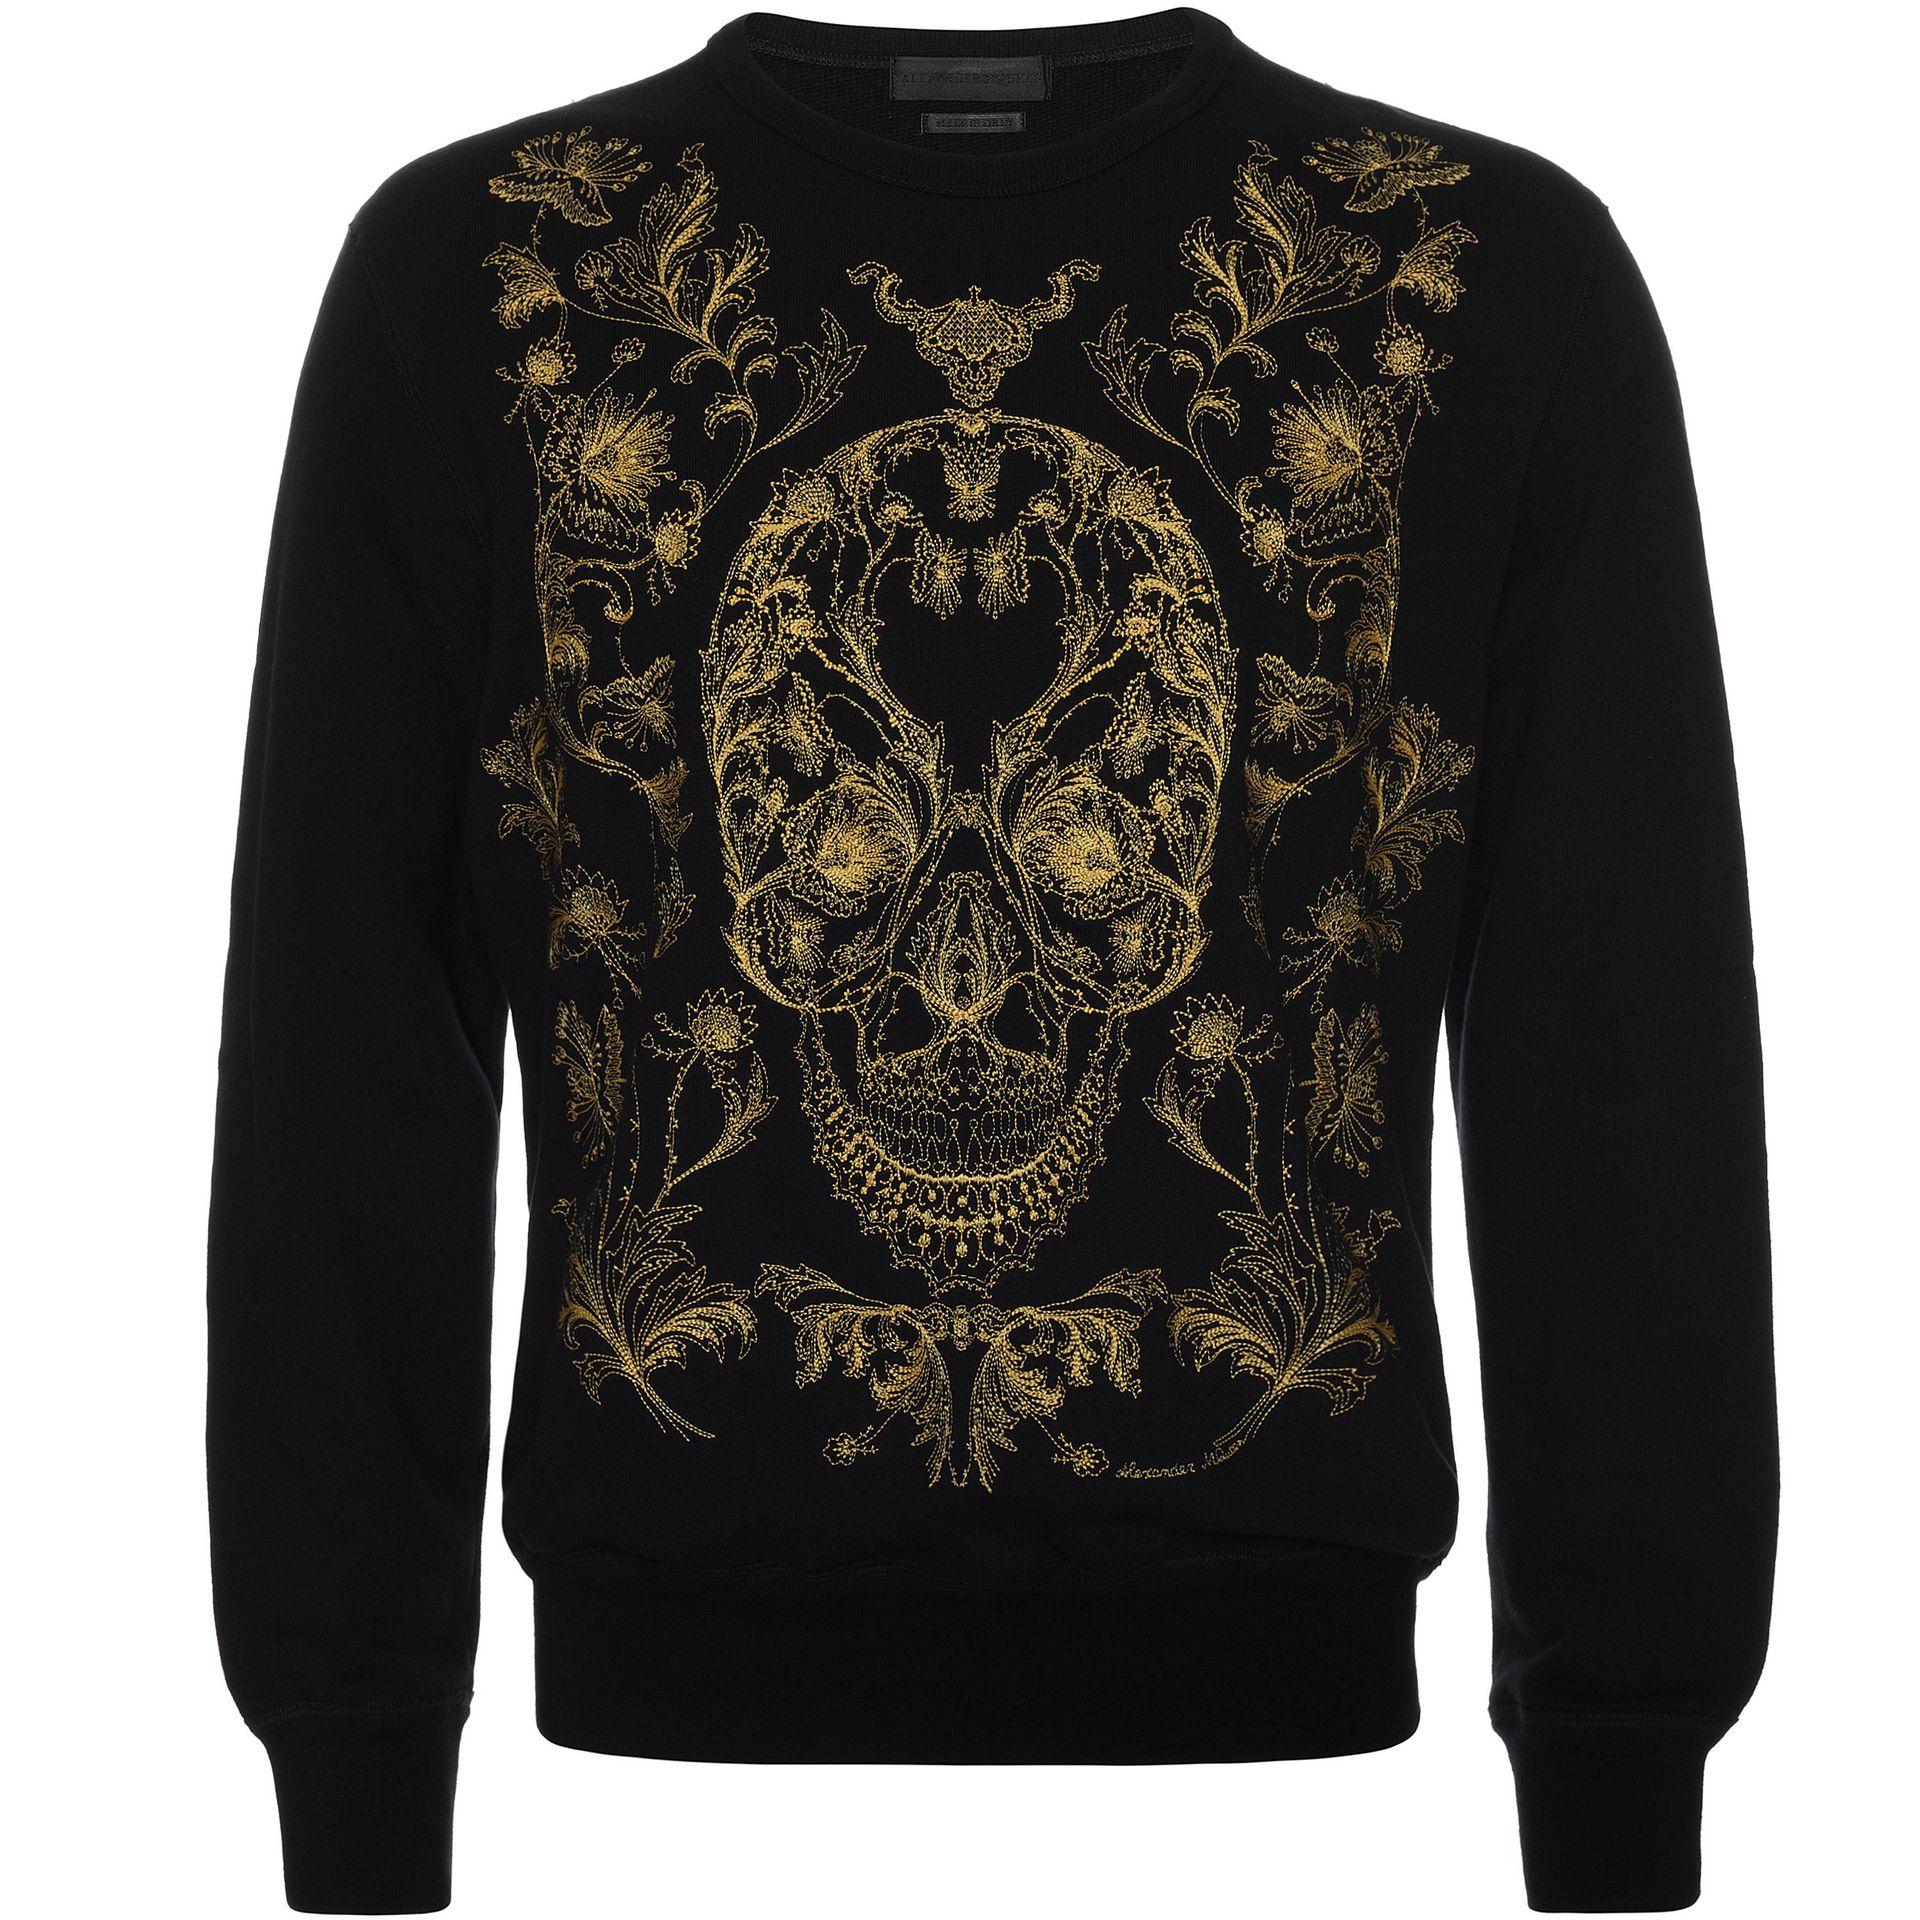 lyst alexander mcqueen floral skull embroidery sweatshirt for men. Black Bedroom Furniture Sets. Home Design Ideas